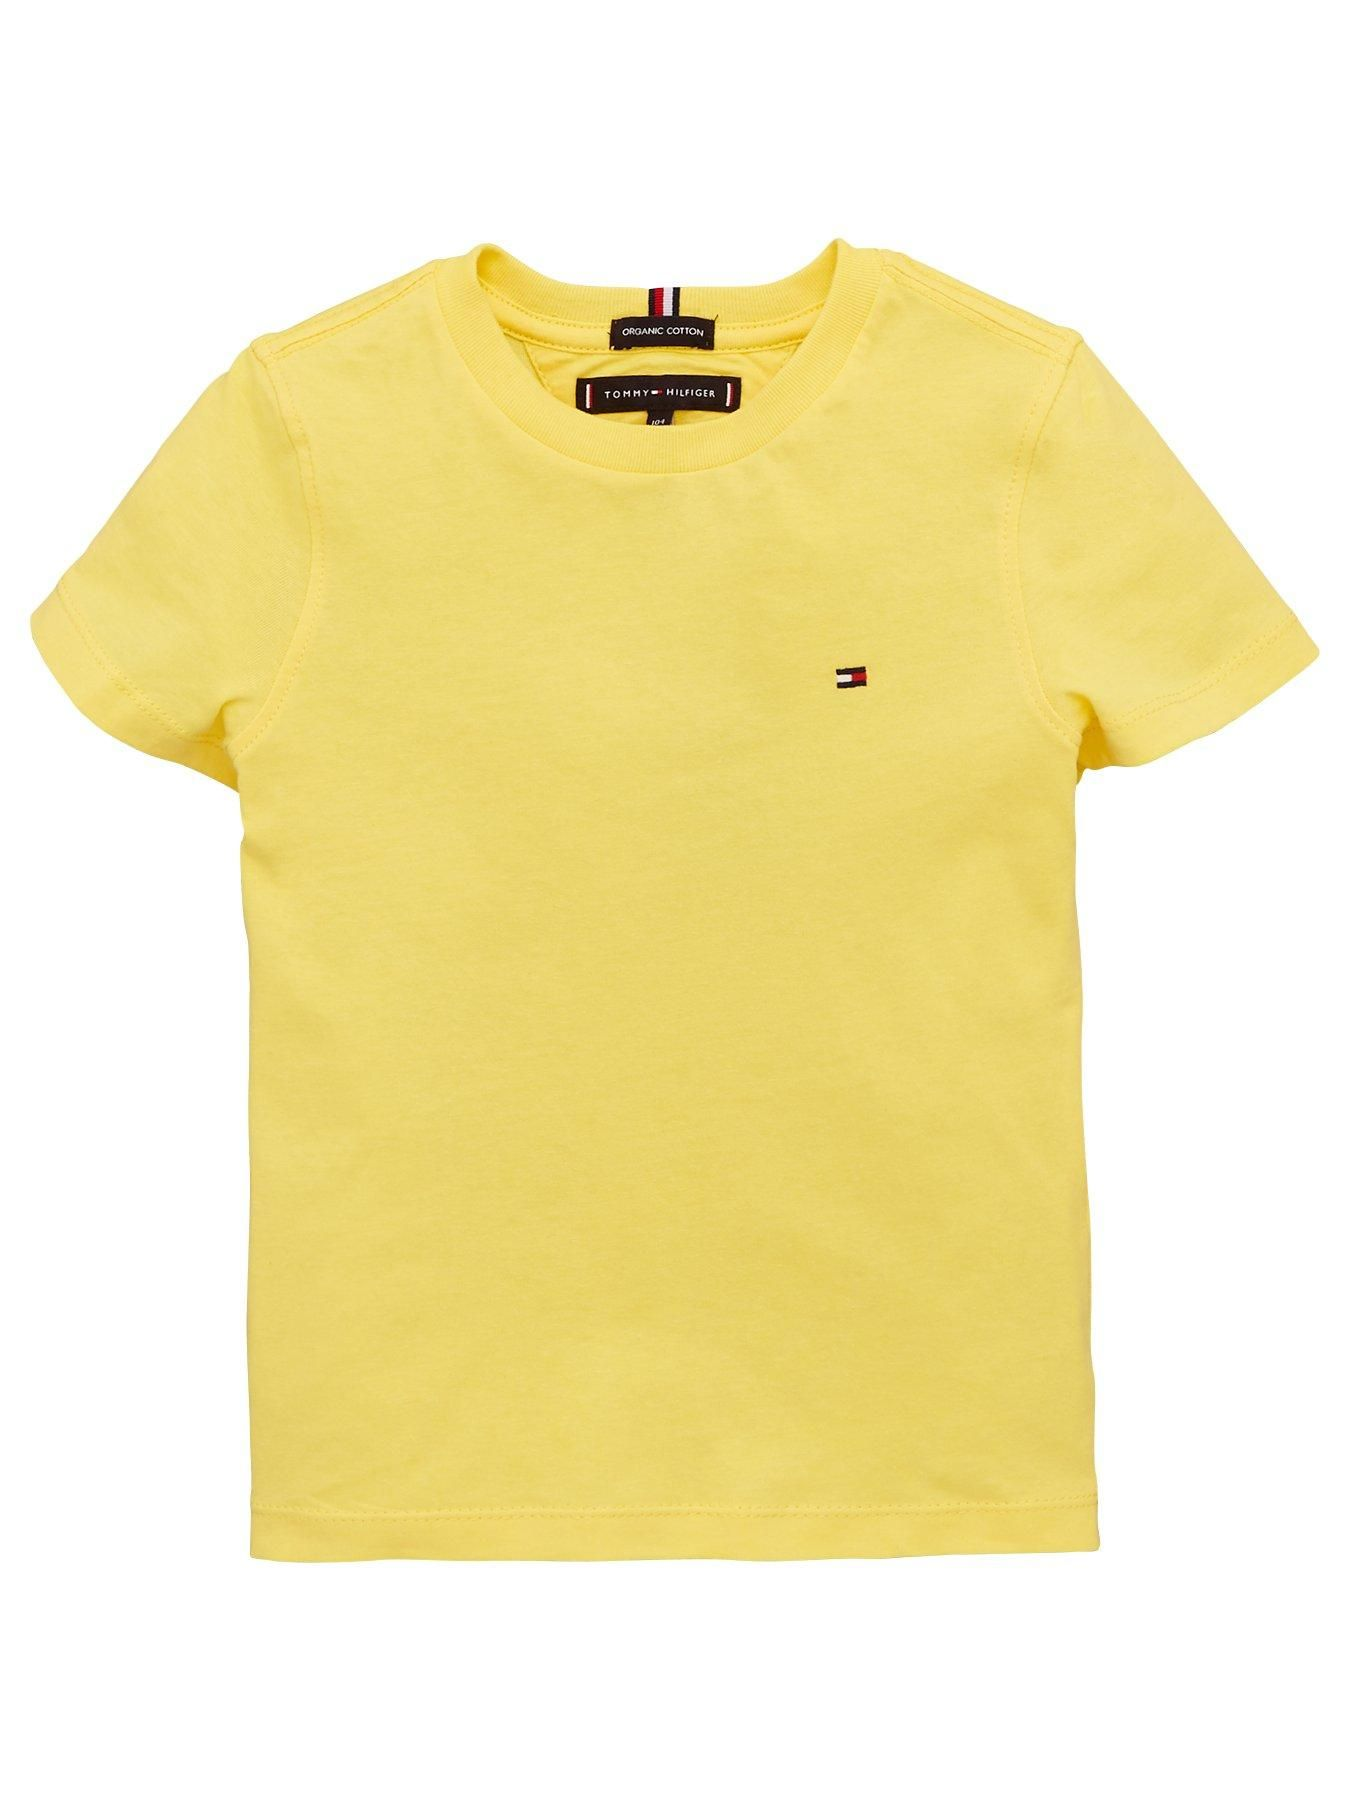 Boys Essential Flag Short Sleeve T Shirt Yellow Tommy Hilfiger Boys T Shirts T Shirt